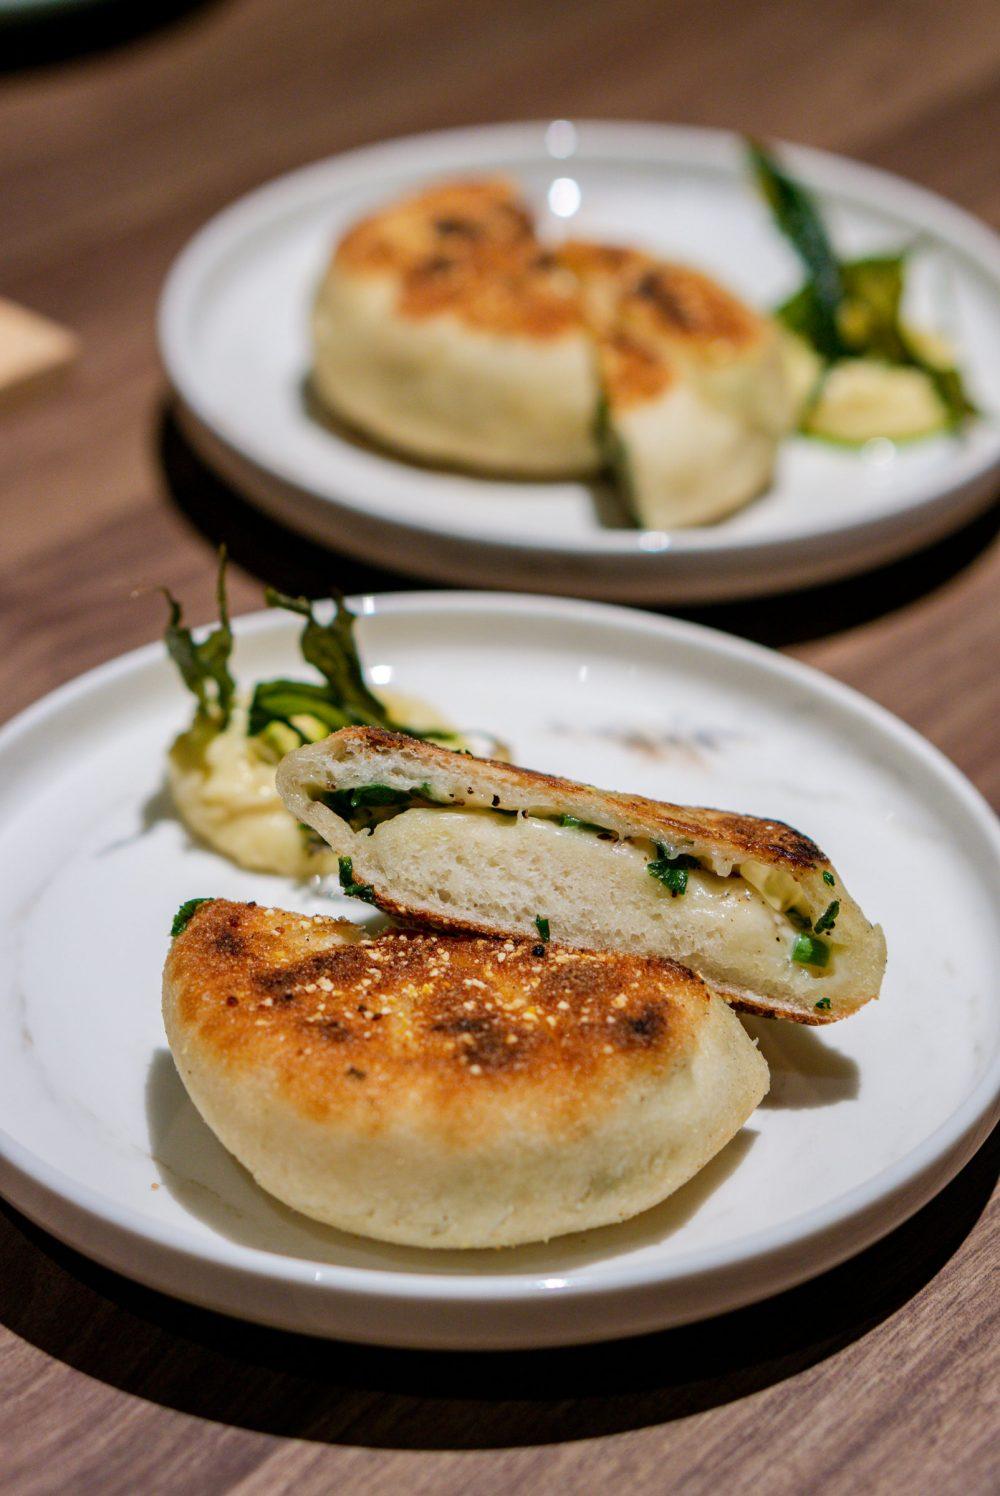 Restaurant-Ibid-Woo-Wai-Leong-Spring-Onion-Shao-Bing-2-2-1000x1496.jpg